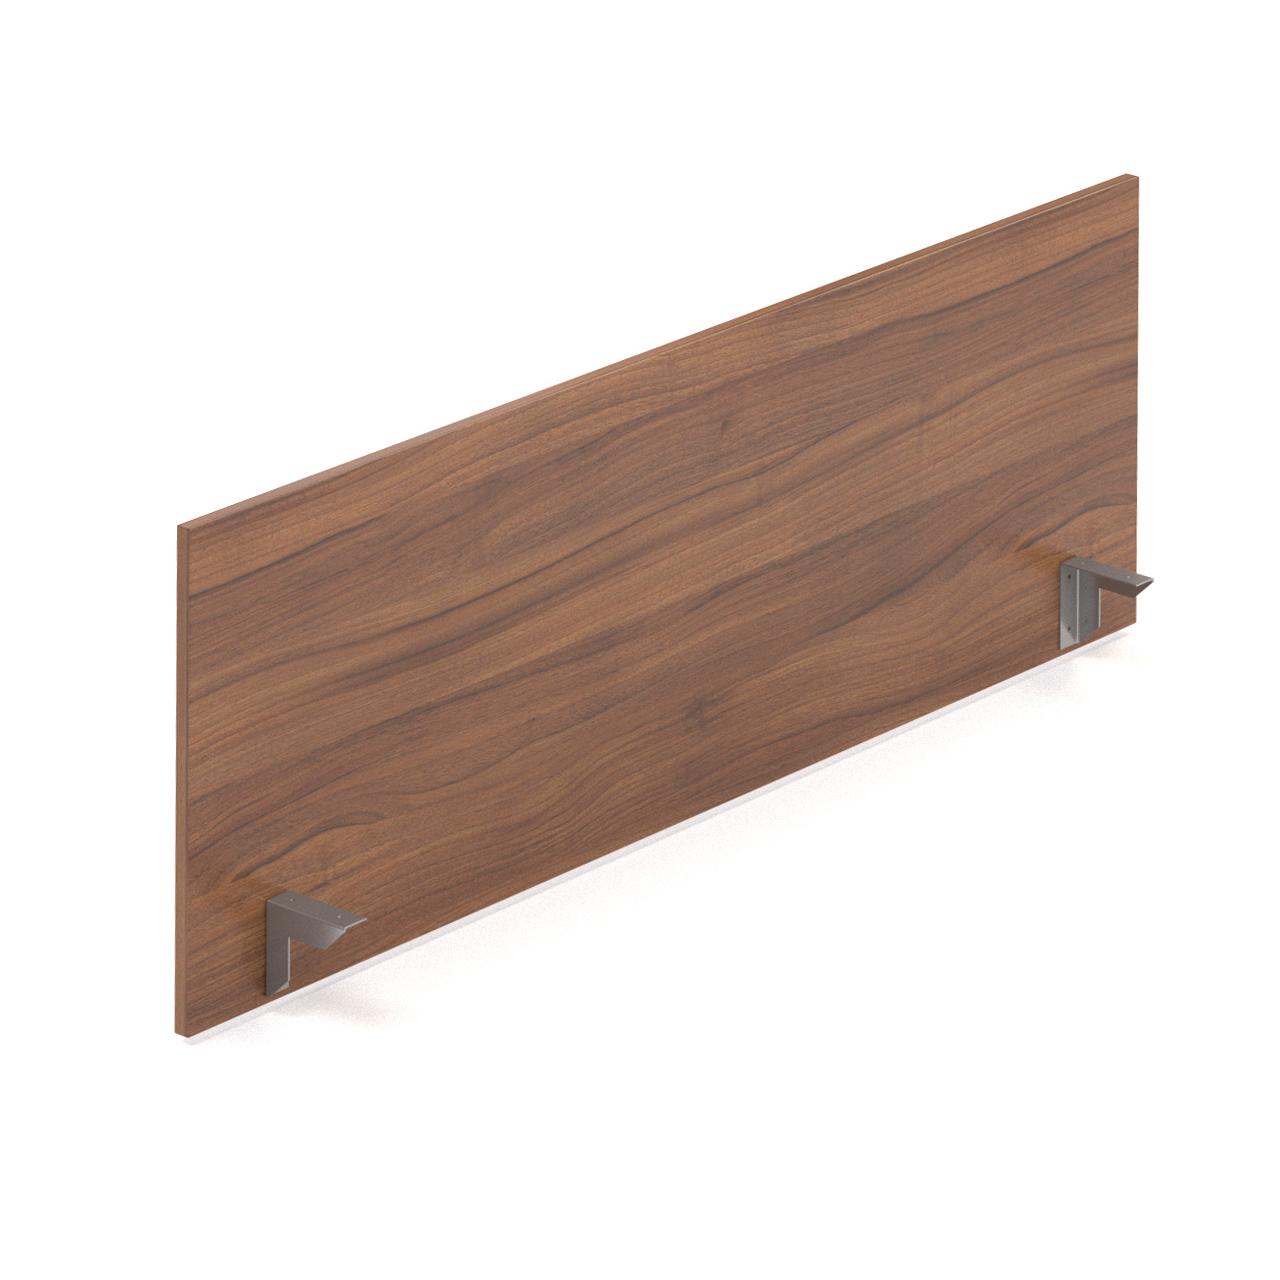 Deliaci panel Komfort 140x49 cm - PD14 19